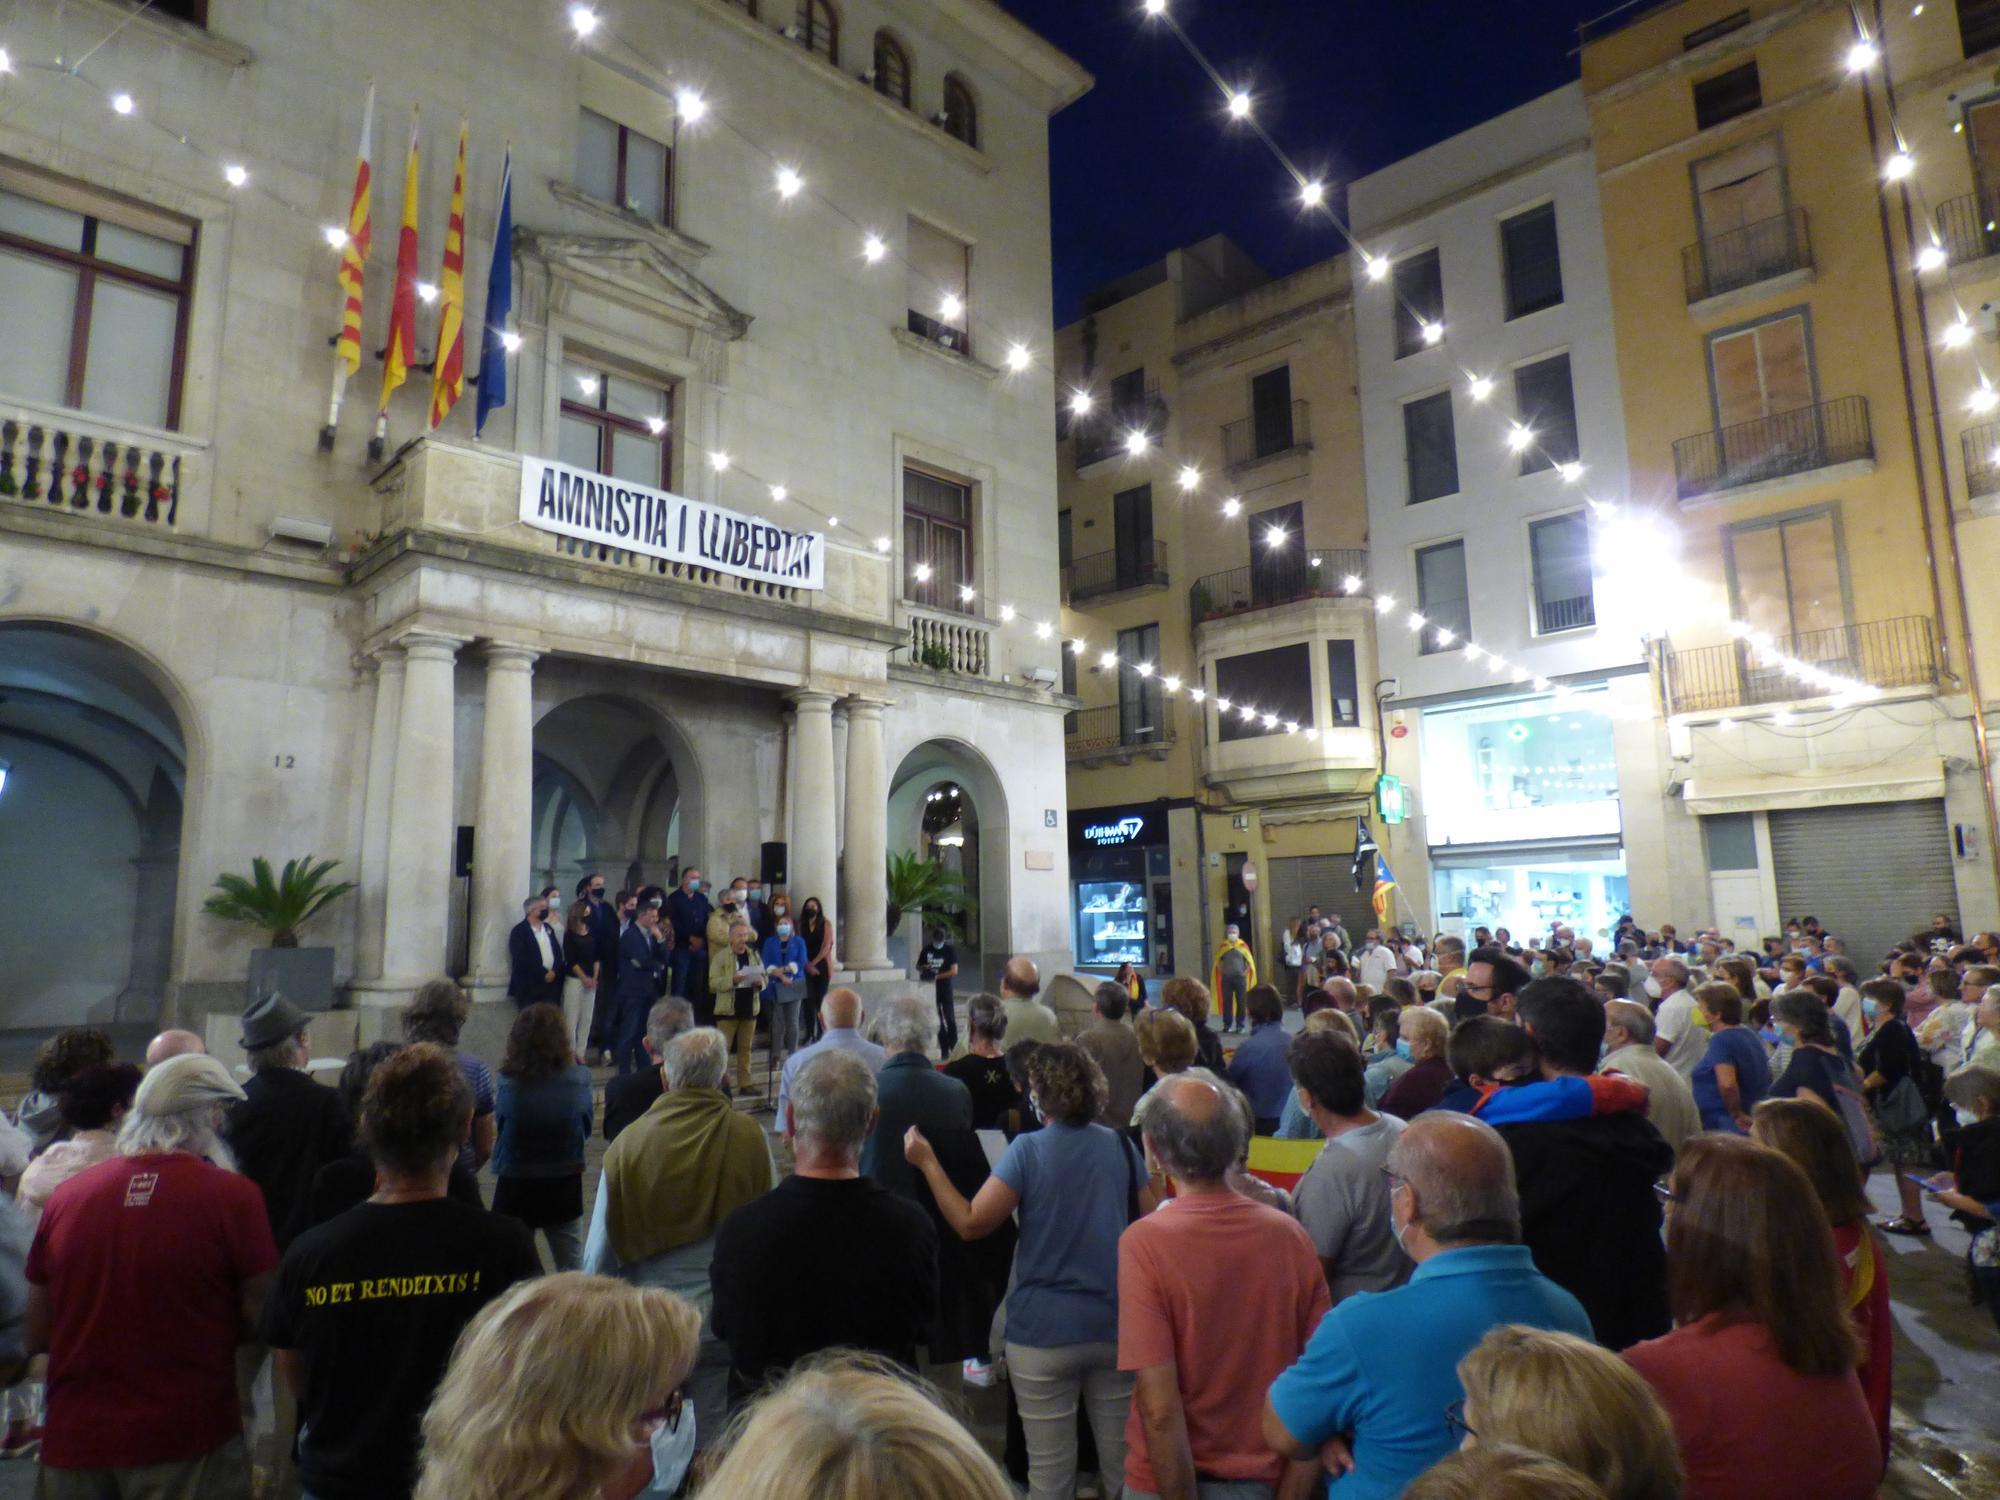 Concentració Free Puigdemont a Figueres